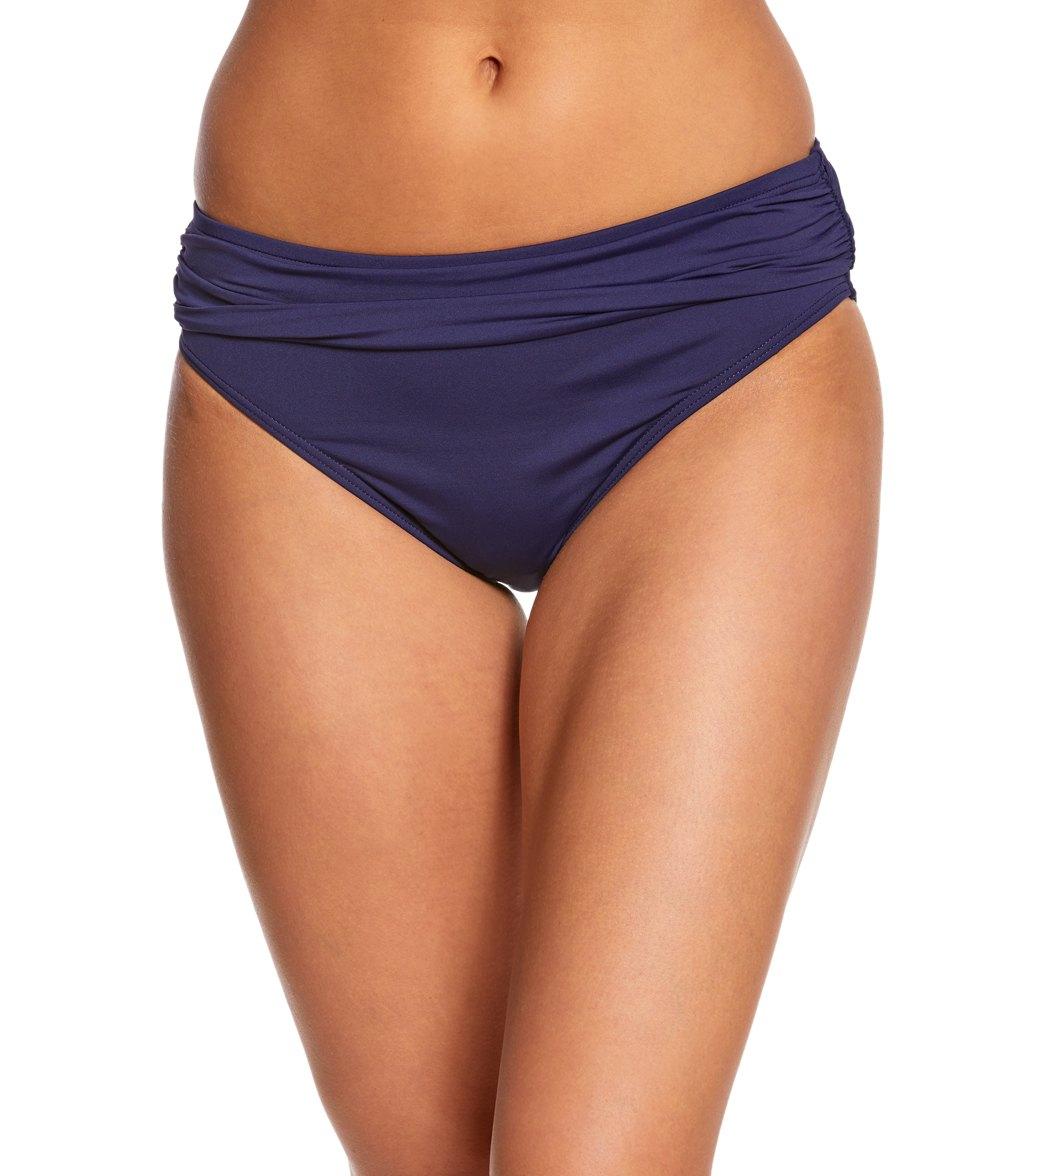 f6e16d5ef1 Tommy Bahama Pearl Solids High Waist Sash Bikini Bottom at SwimOutlet.com -  Free Shipping